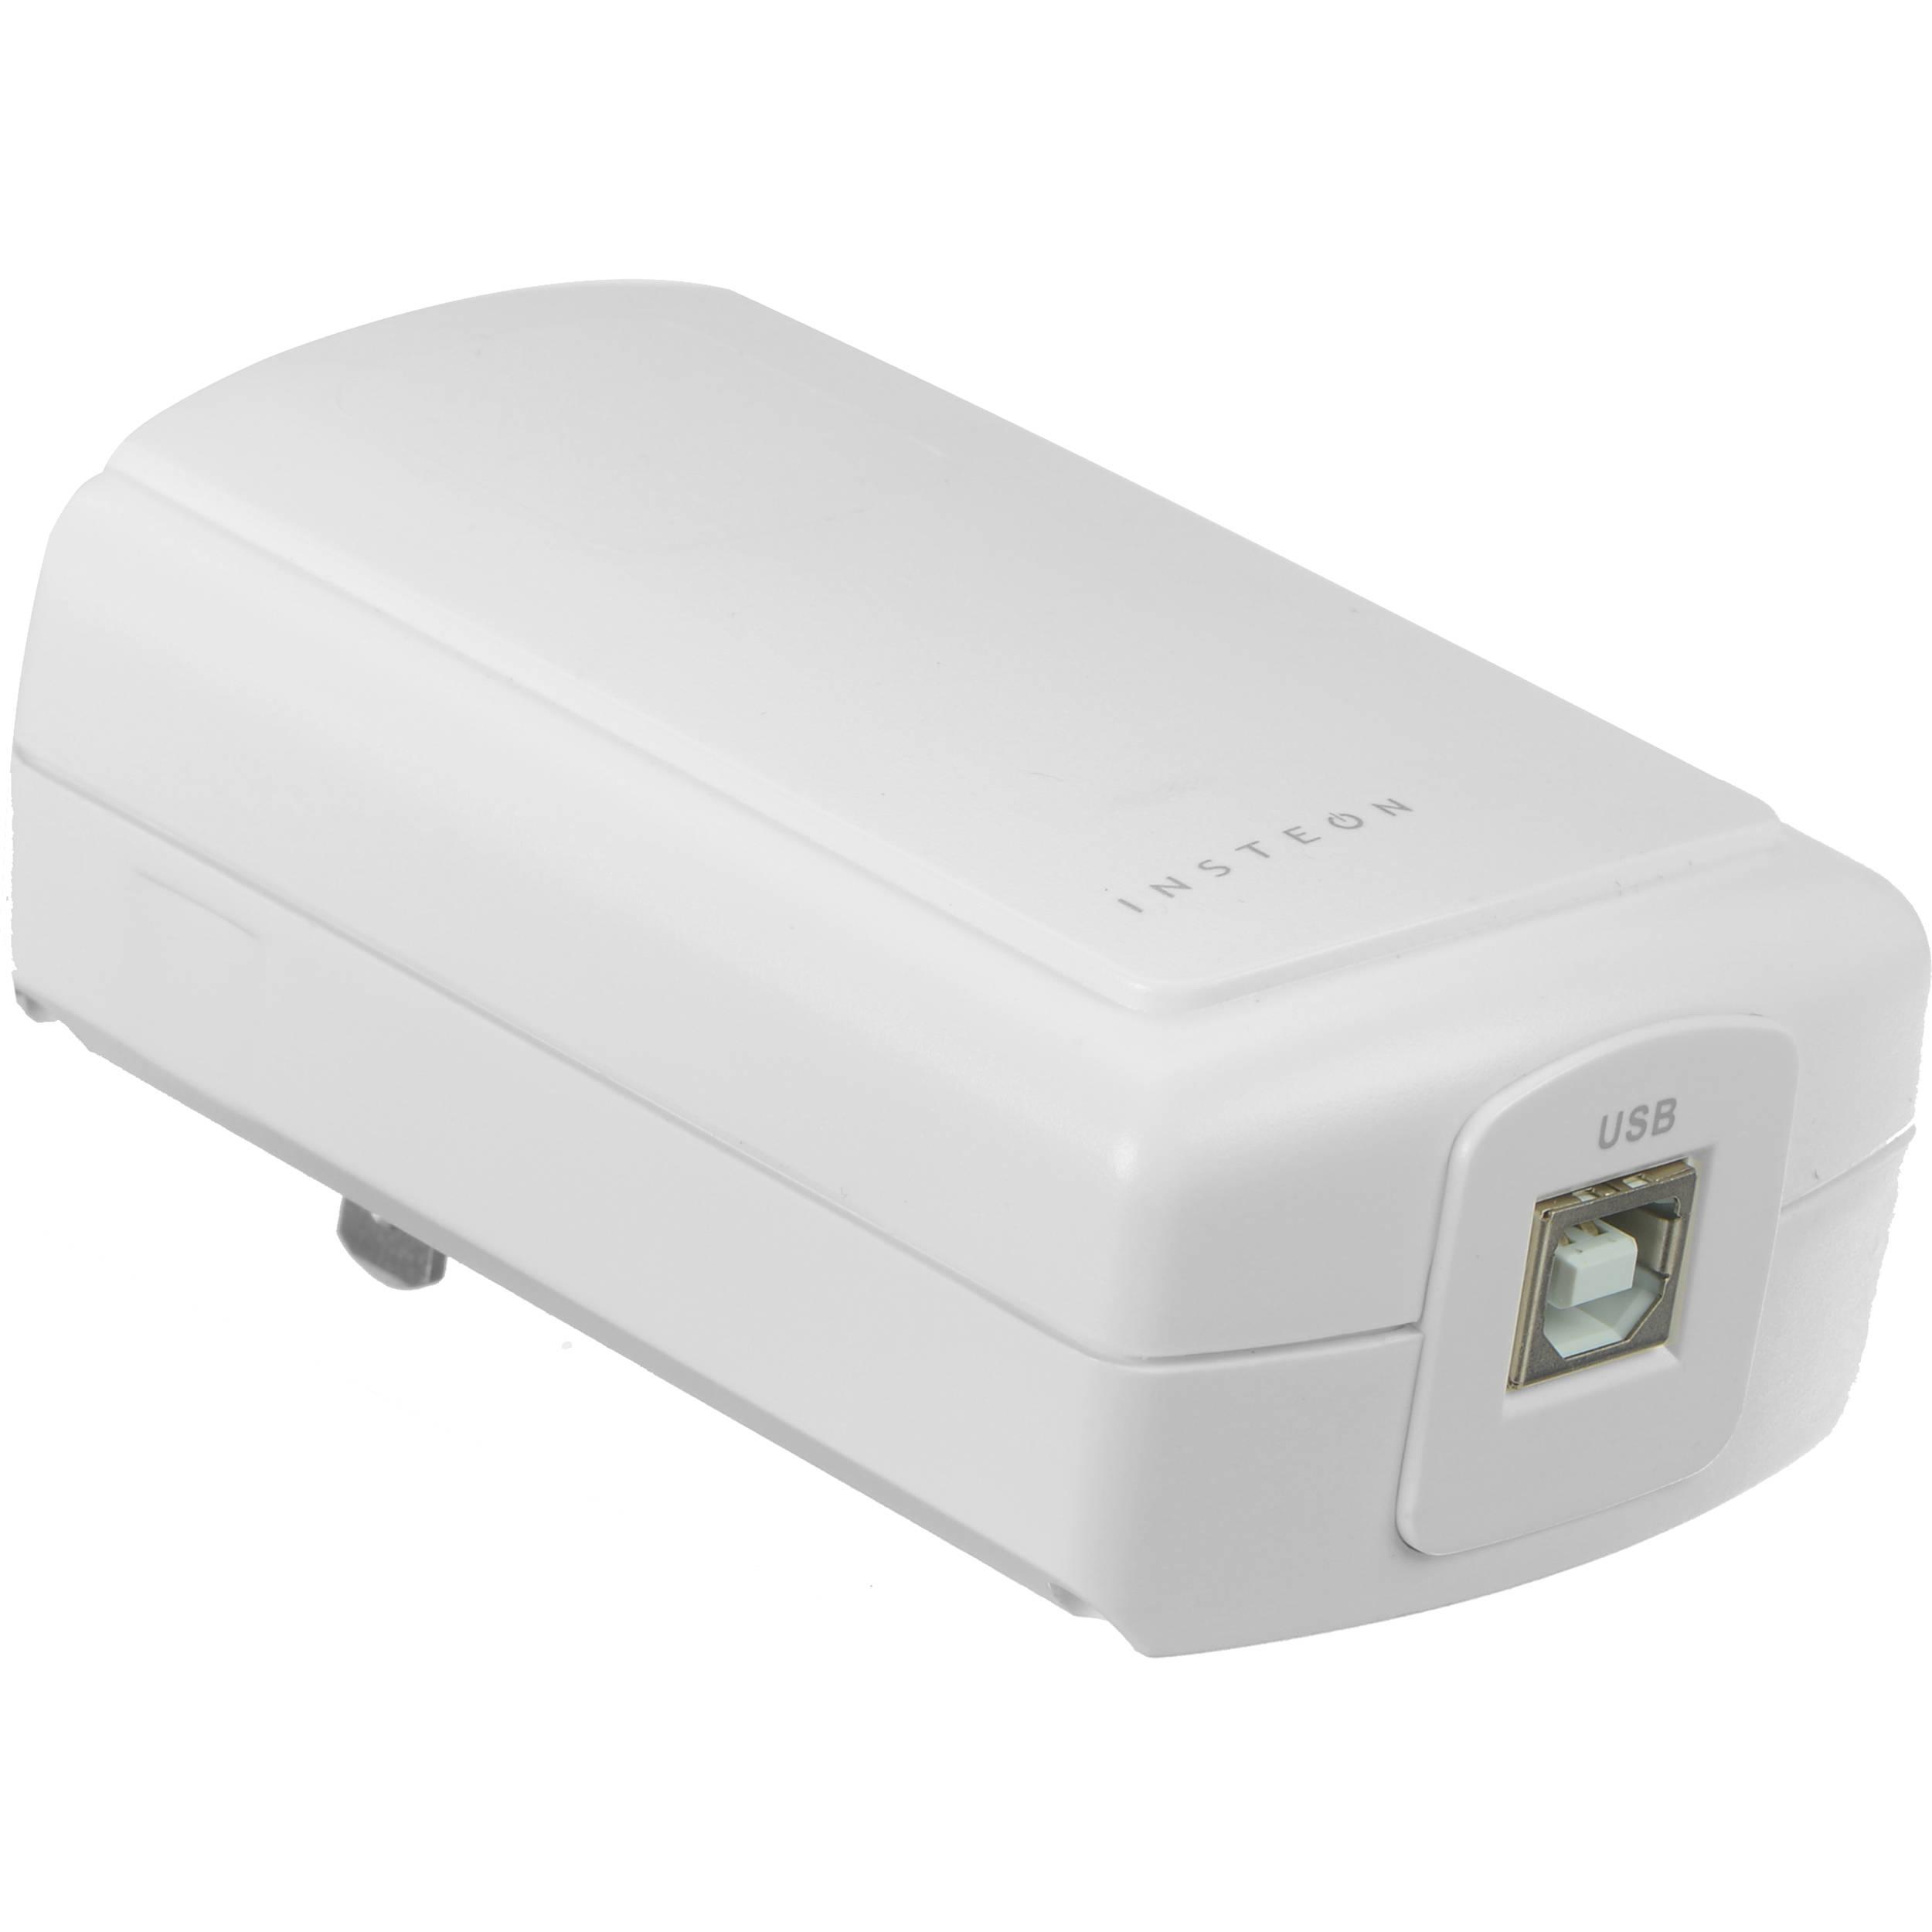 insteon smarthome powerlinc modem dual band usb interface 2413u. Black Bedroom Furniture Sets. Home Design Ideas